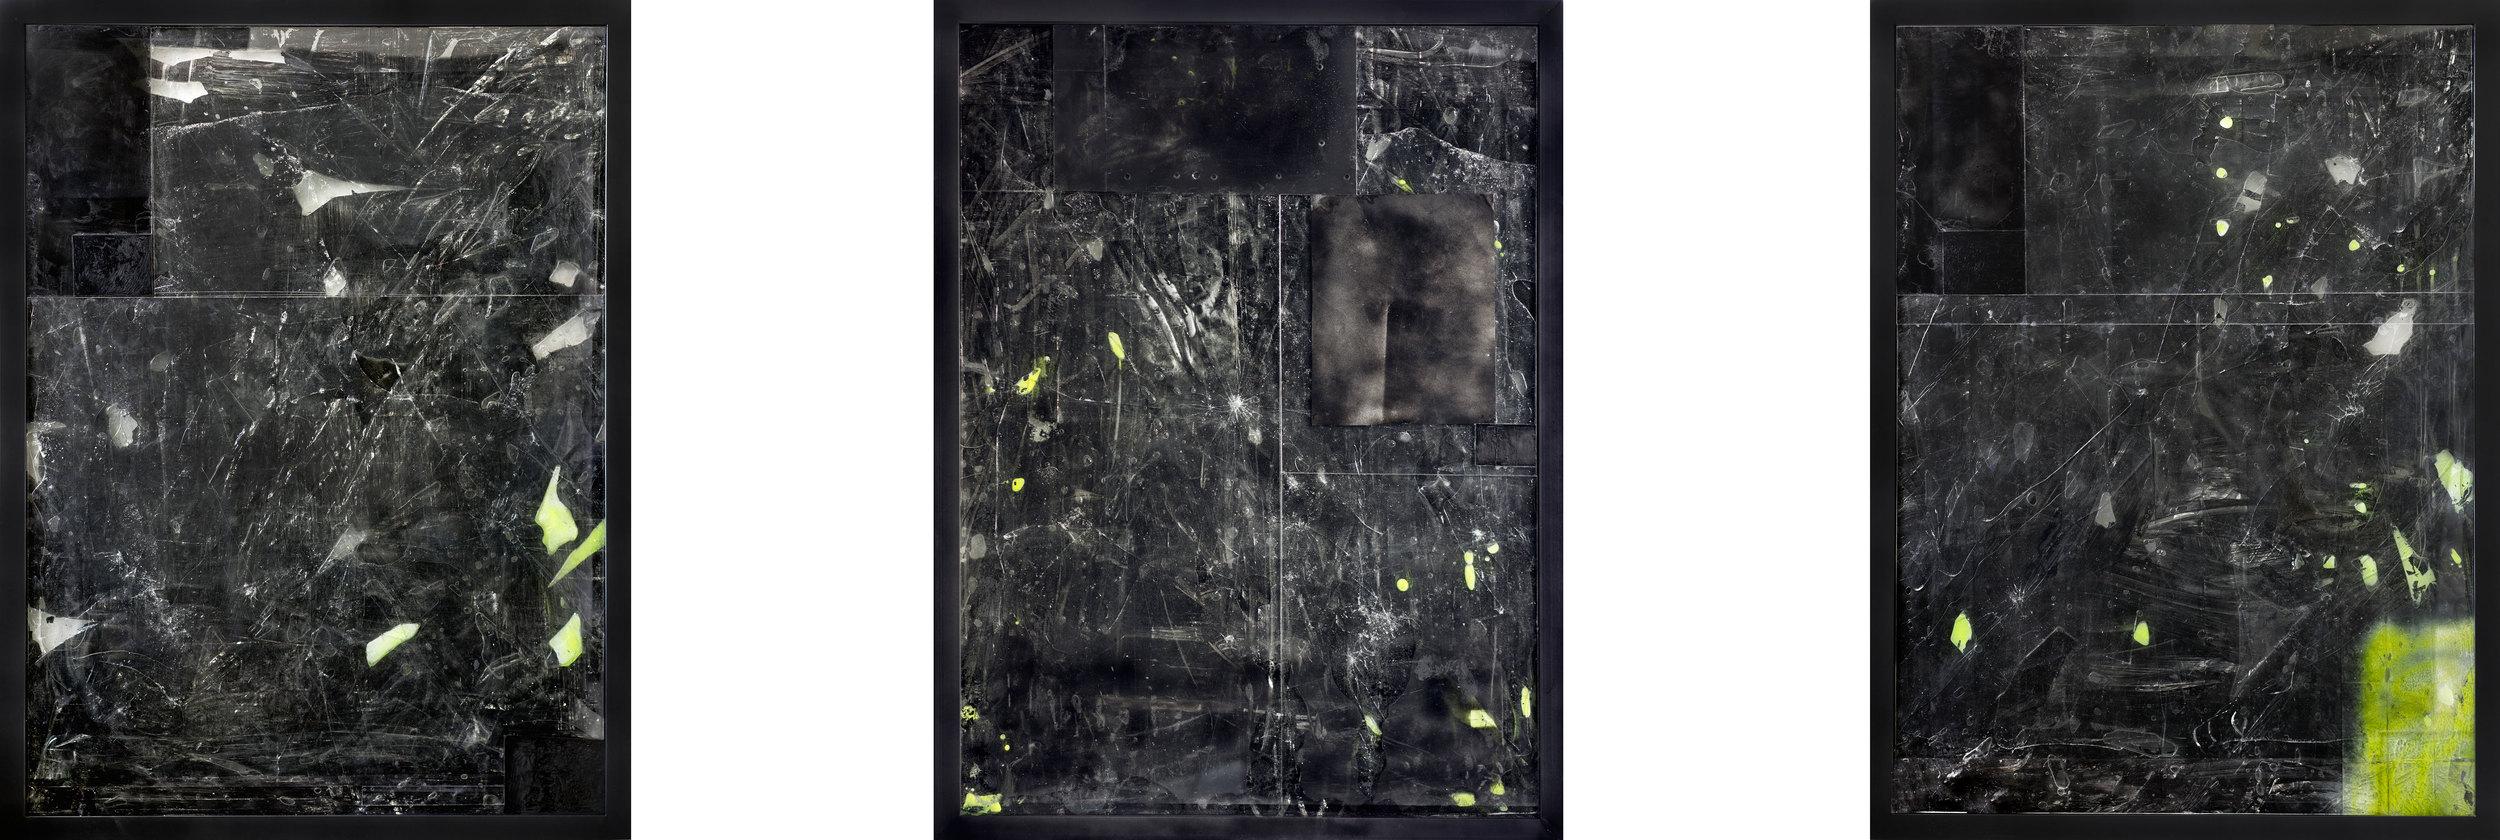 Triptych - 36 x 48 inches each, 2015.